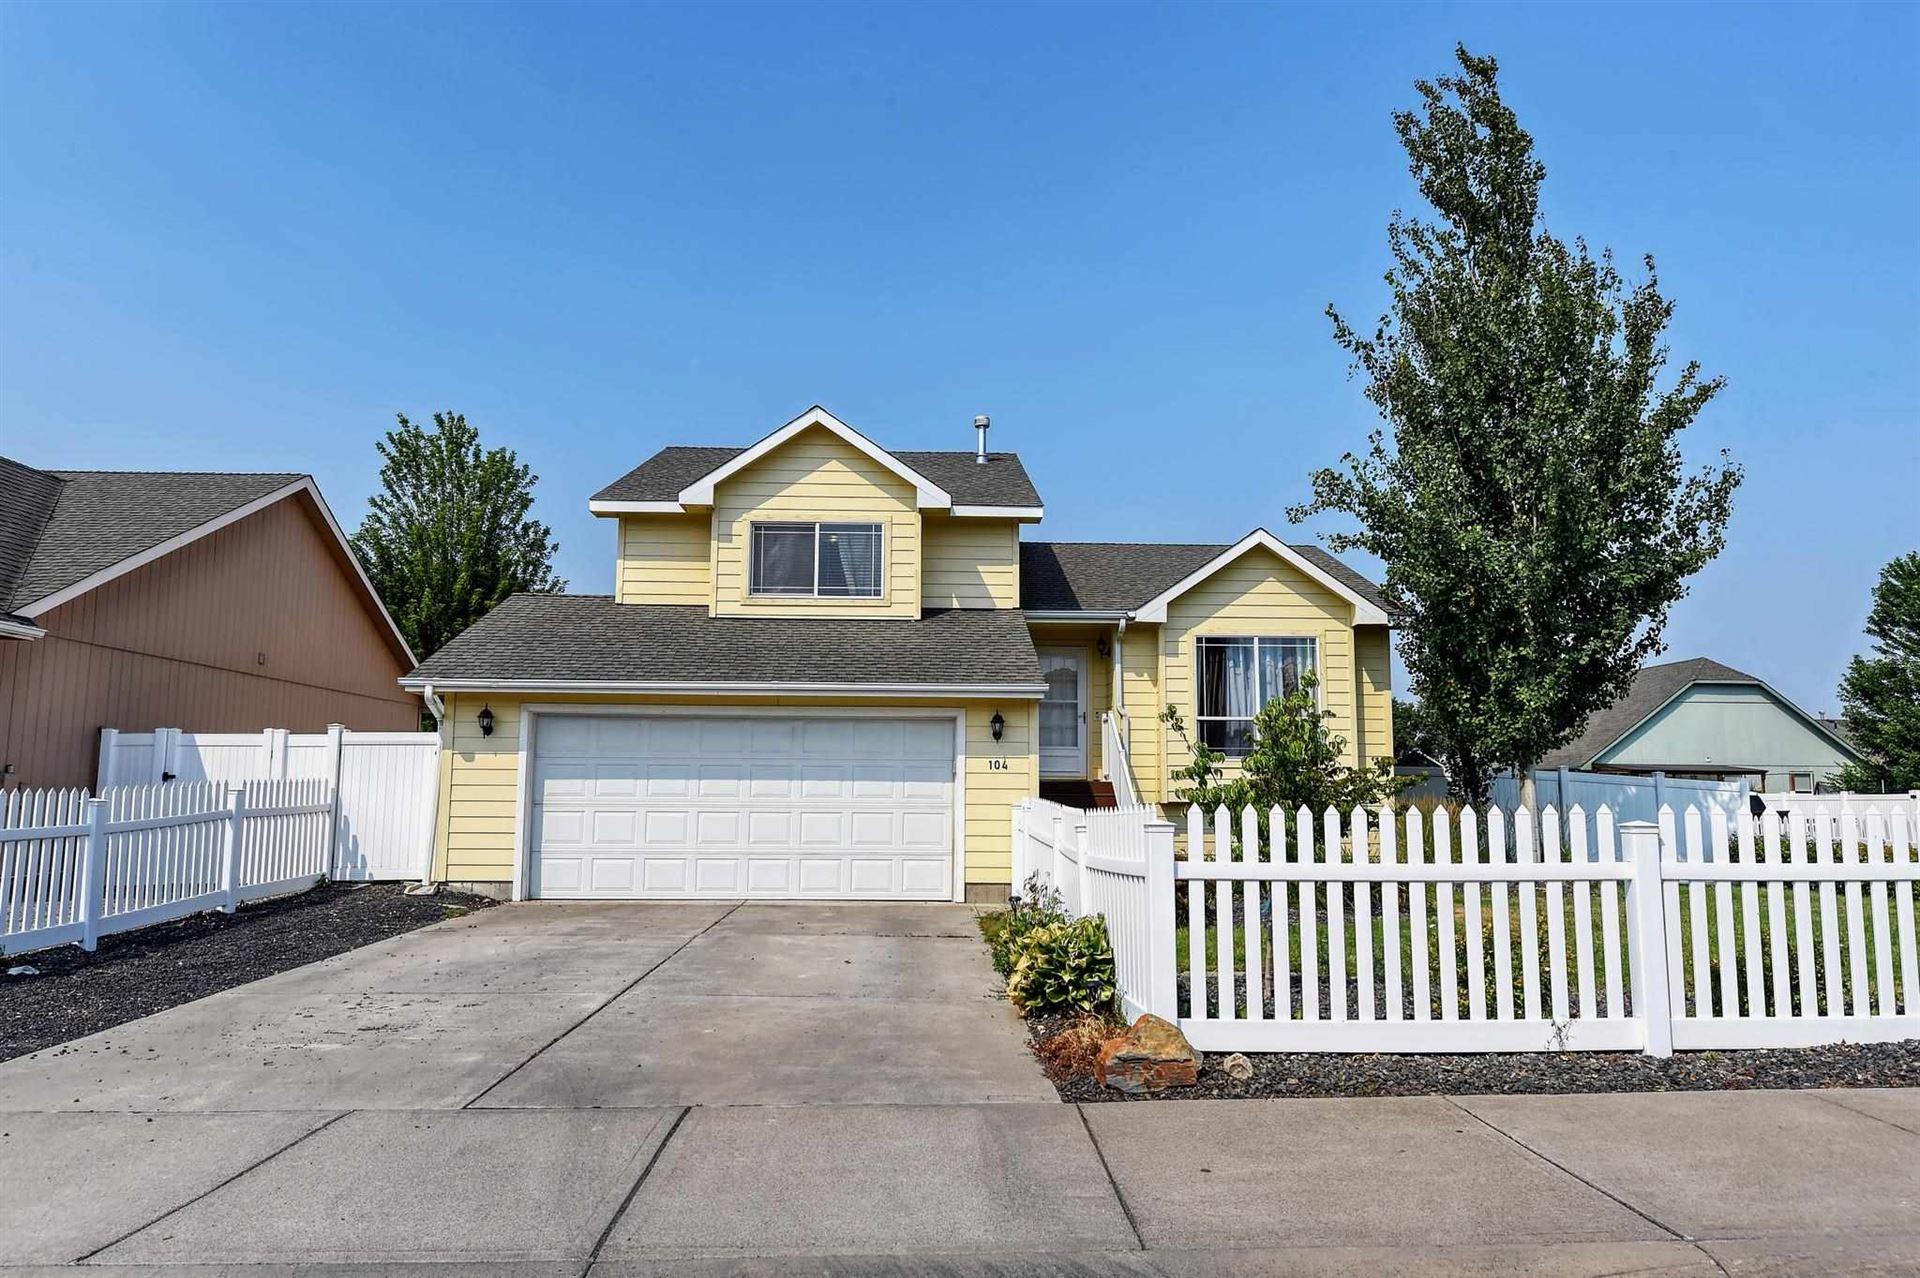 104 S Arties Ln, Spokane Valley, WA 99016-7805 - #: 202120059